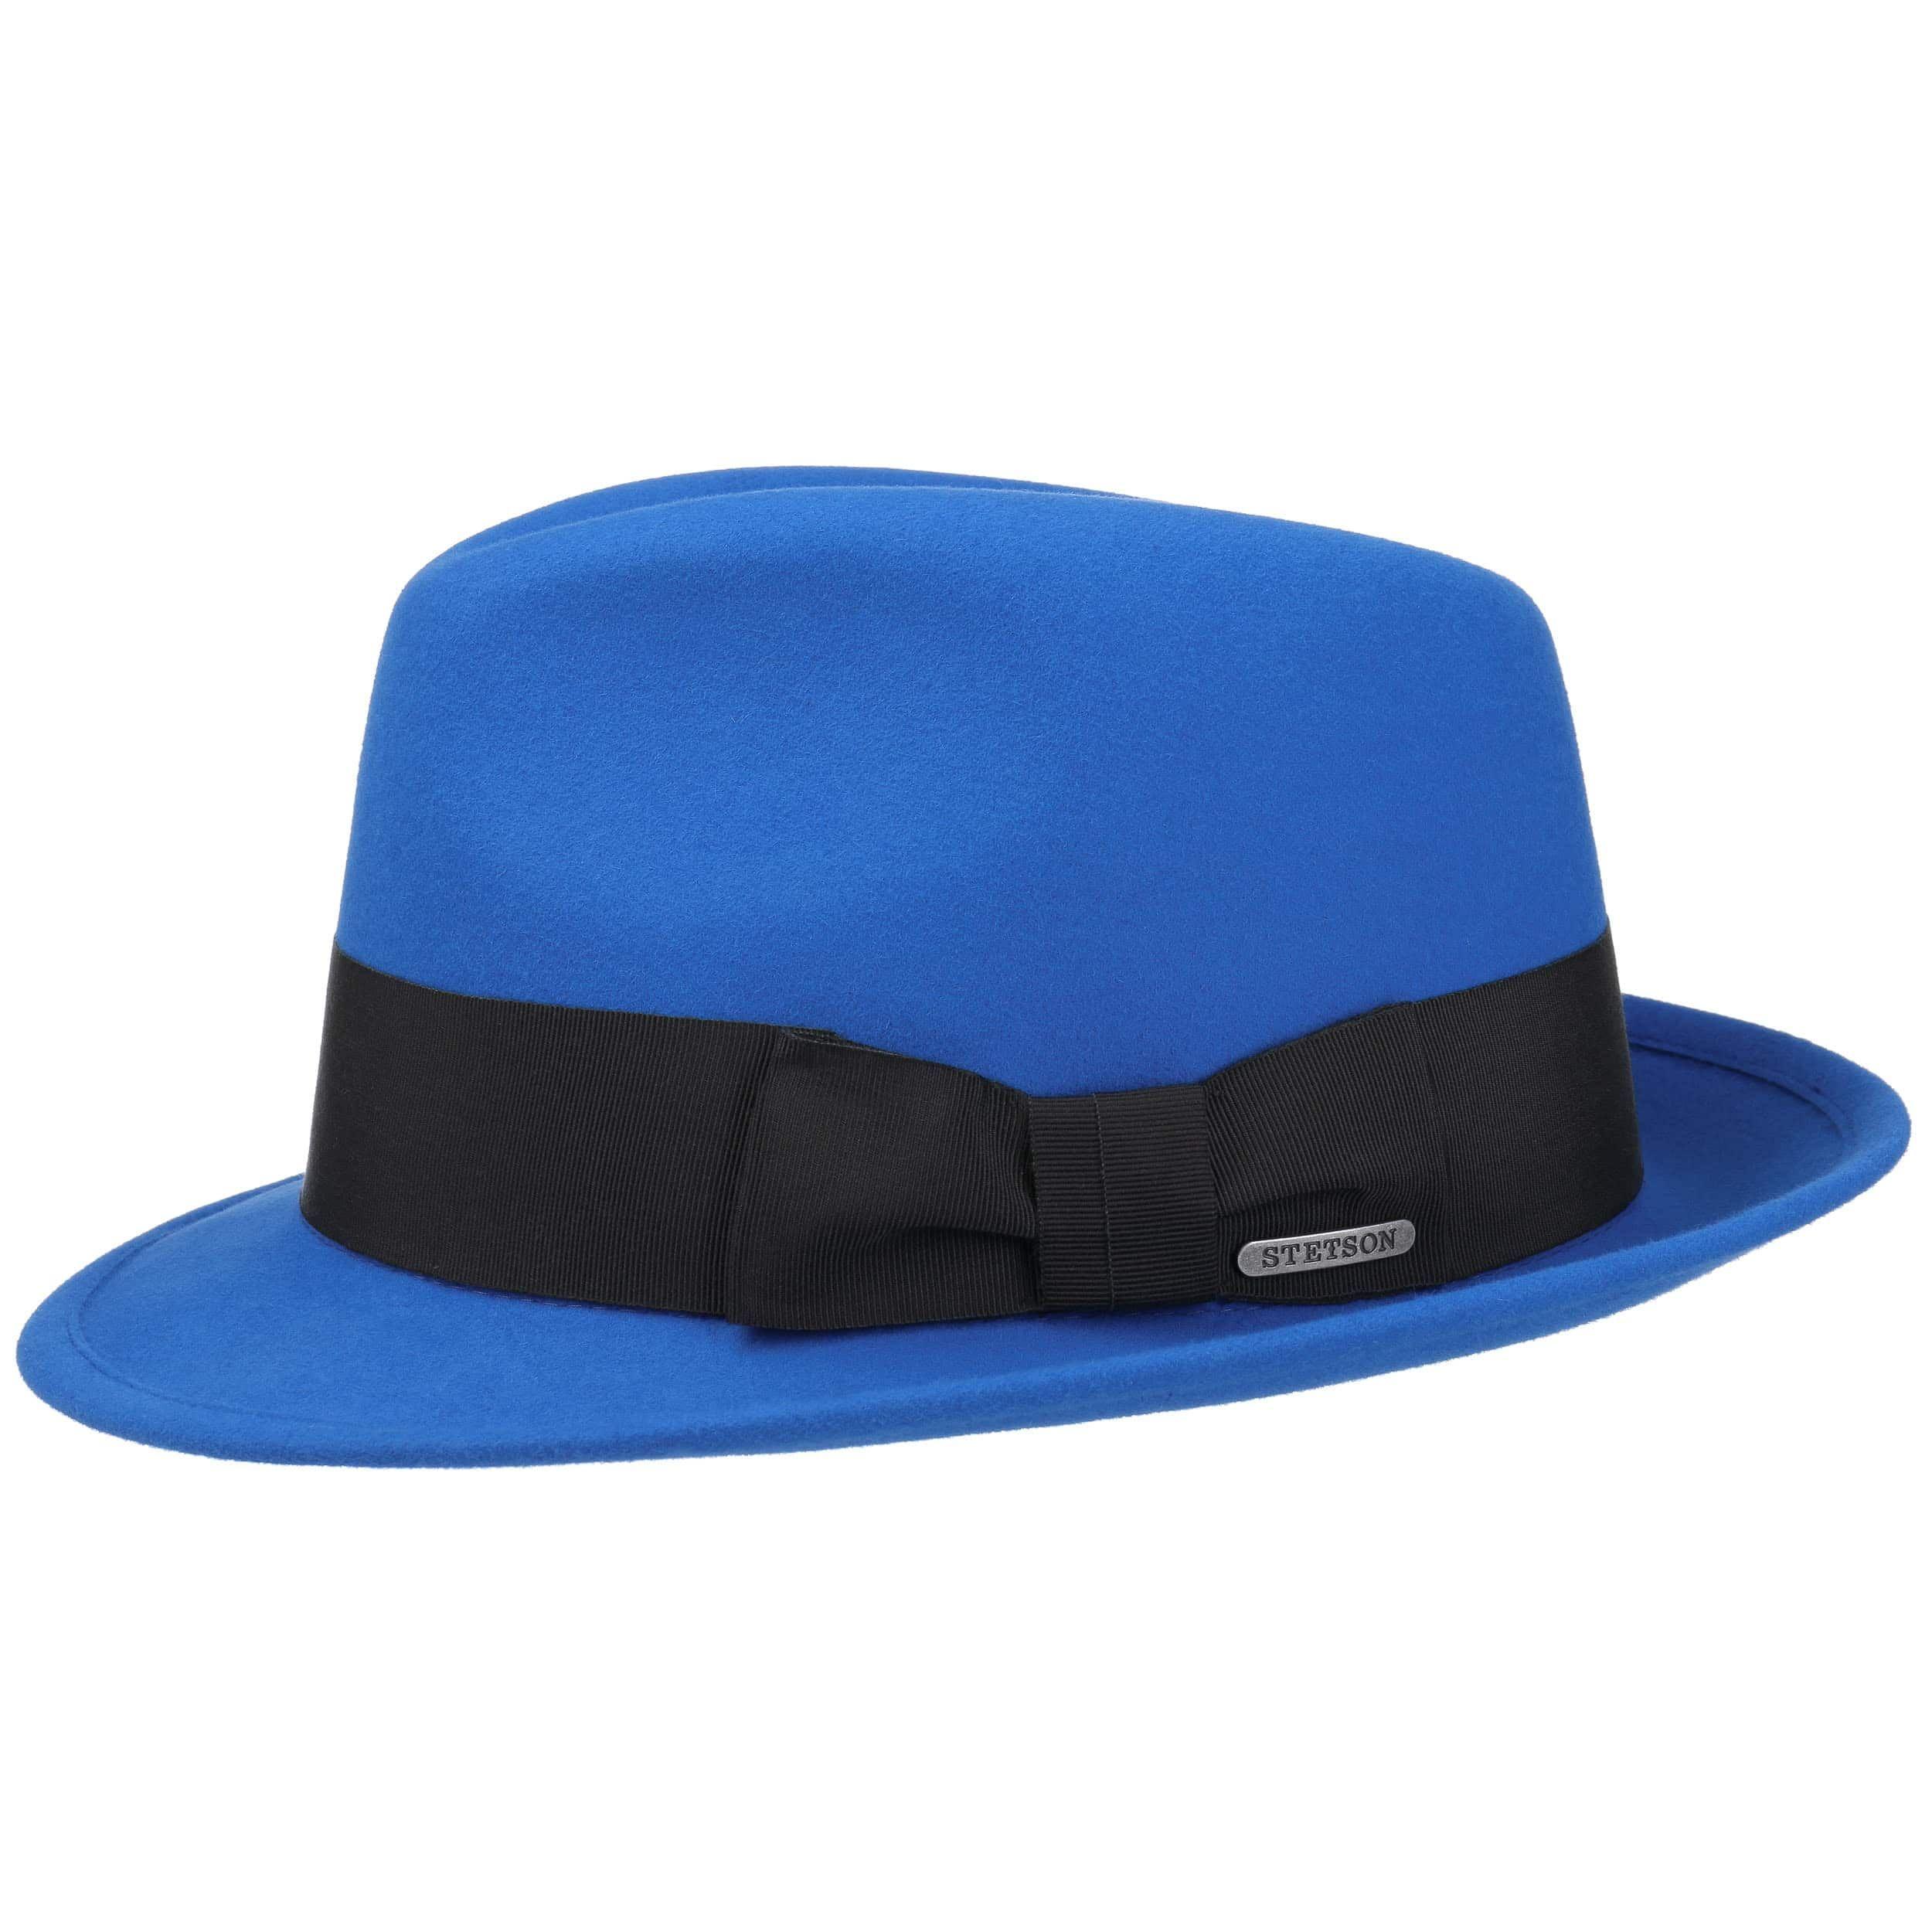 Marico Player Haarfilzhut blau